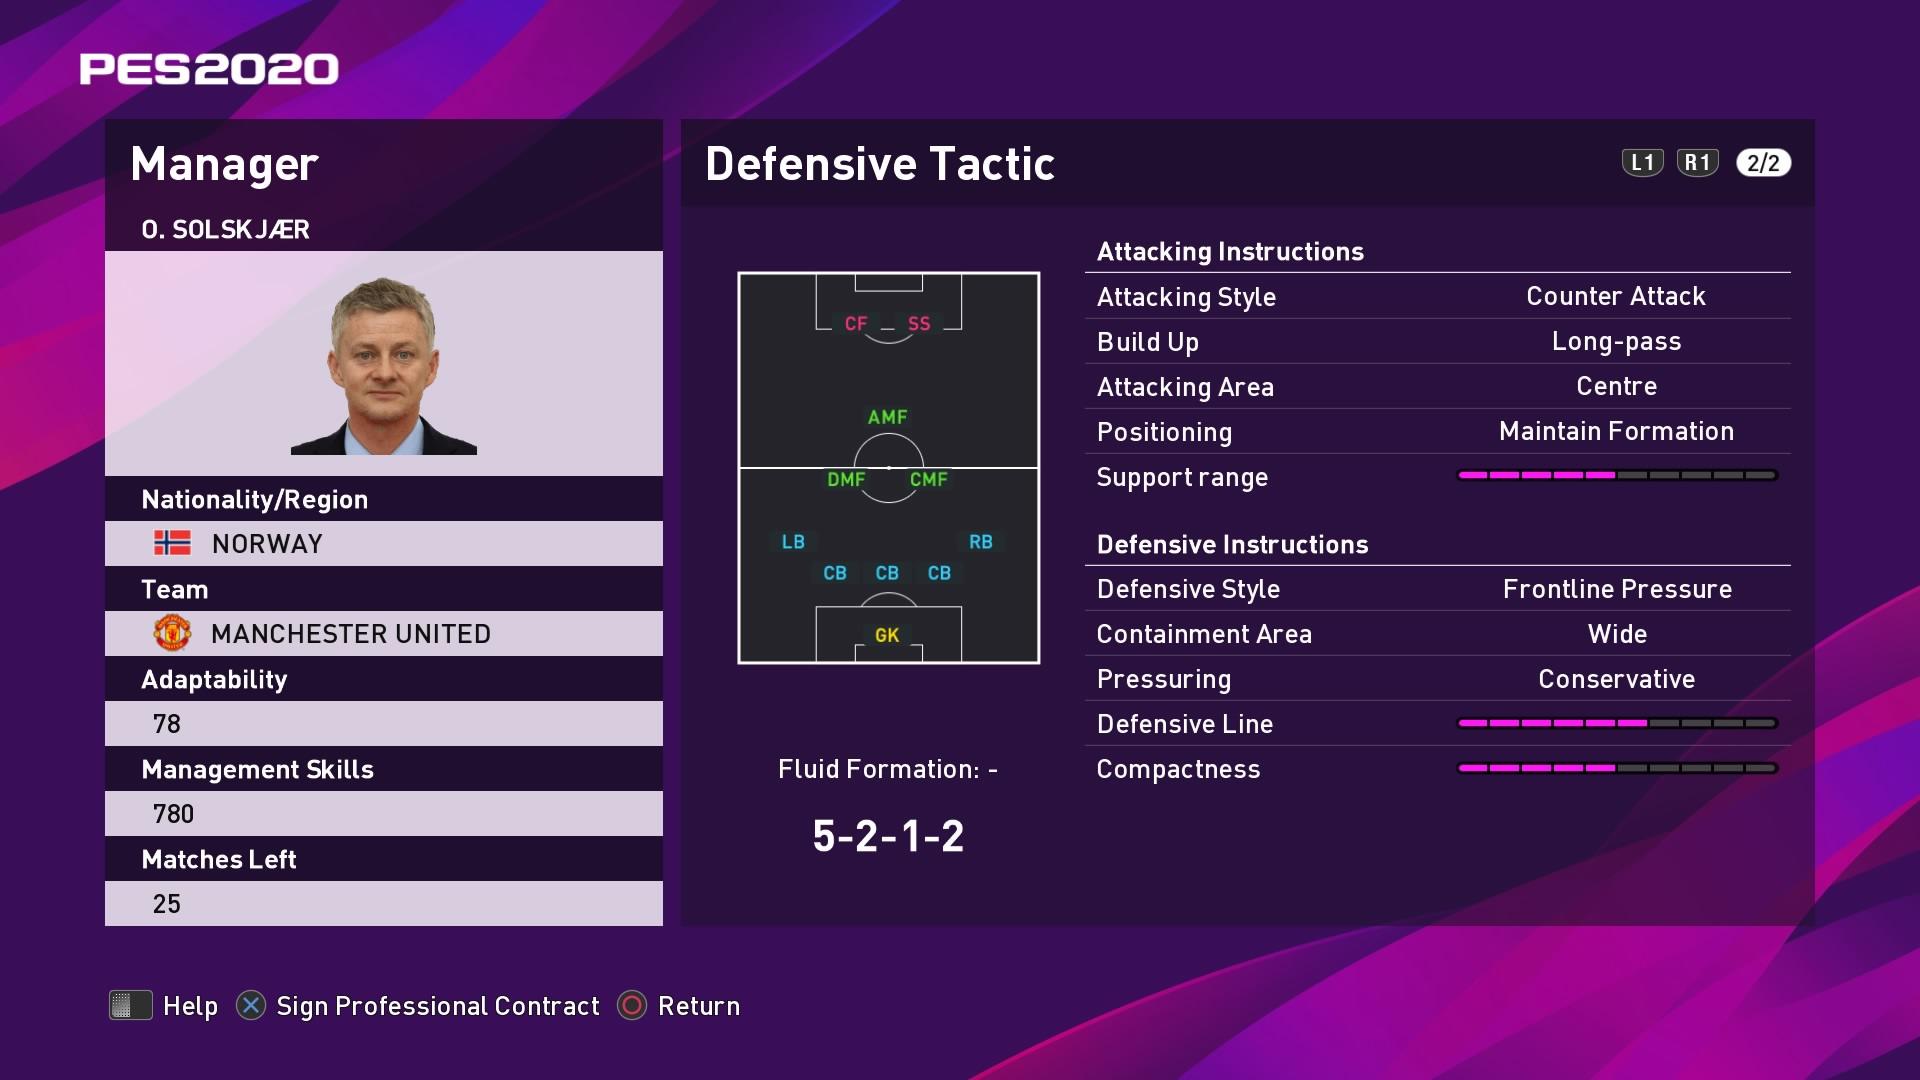 O. Solskjaer (2) (Ole Gunnar Solskjær) Defensive Tactic in PES 2020 myClub